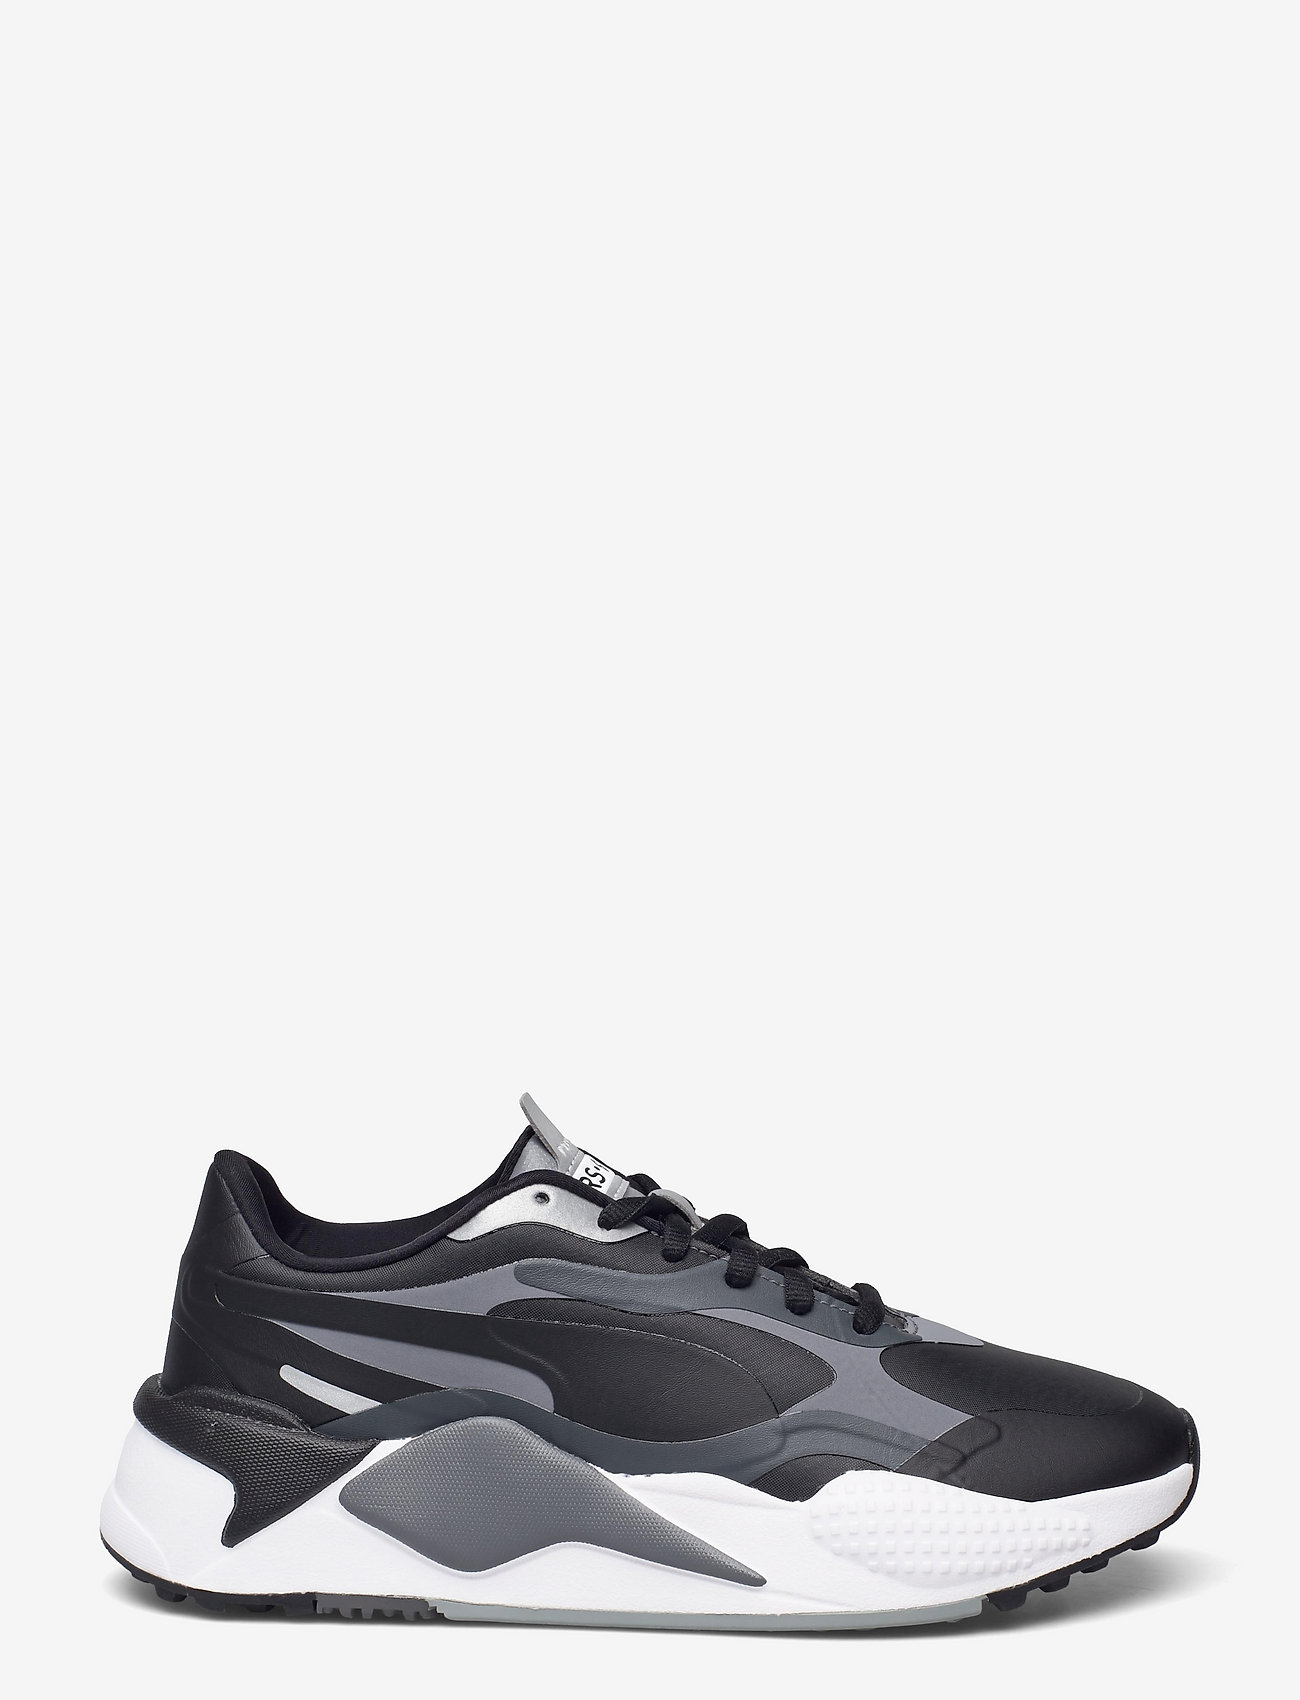 PUMA Golf - RS-G - golf shoes - puma black-quiet shade-dark shadow - 1